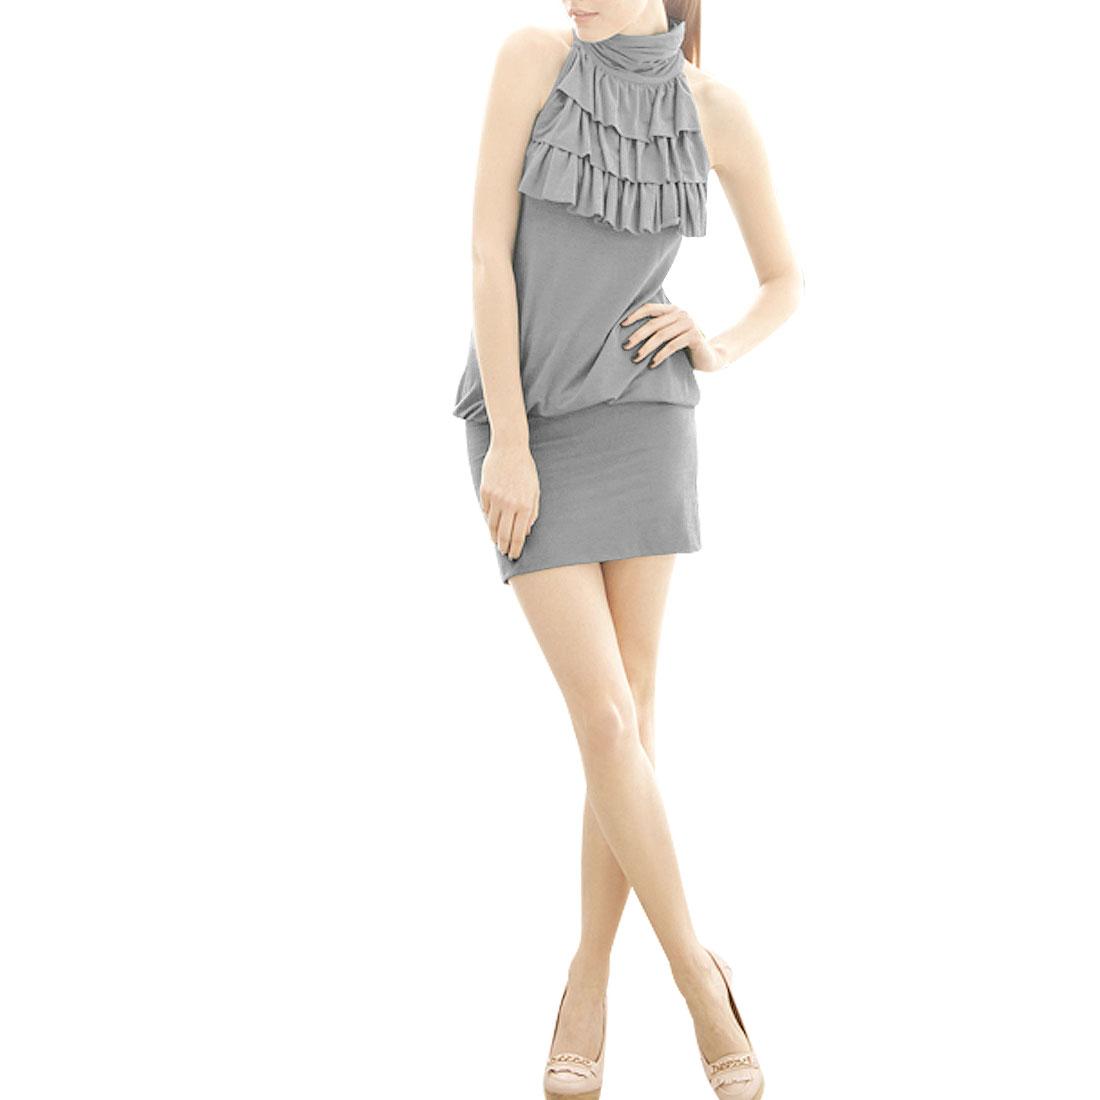 Lady Turtle Neck Pleated Sleeveless Formfitting Mini Dress Gray XS